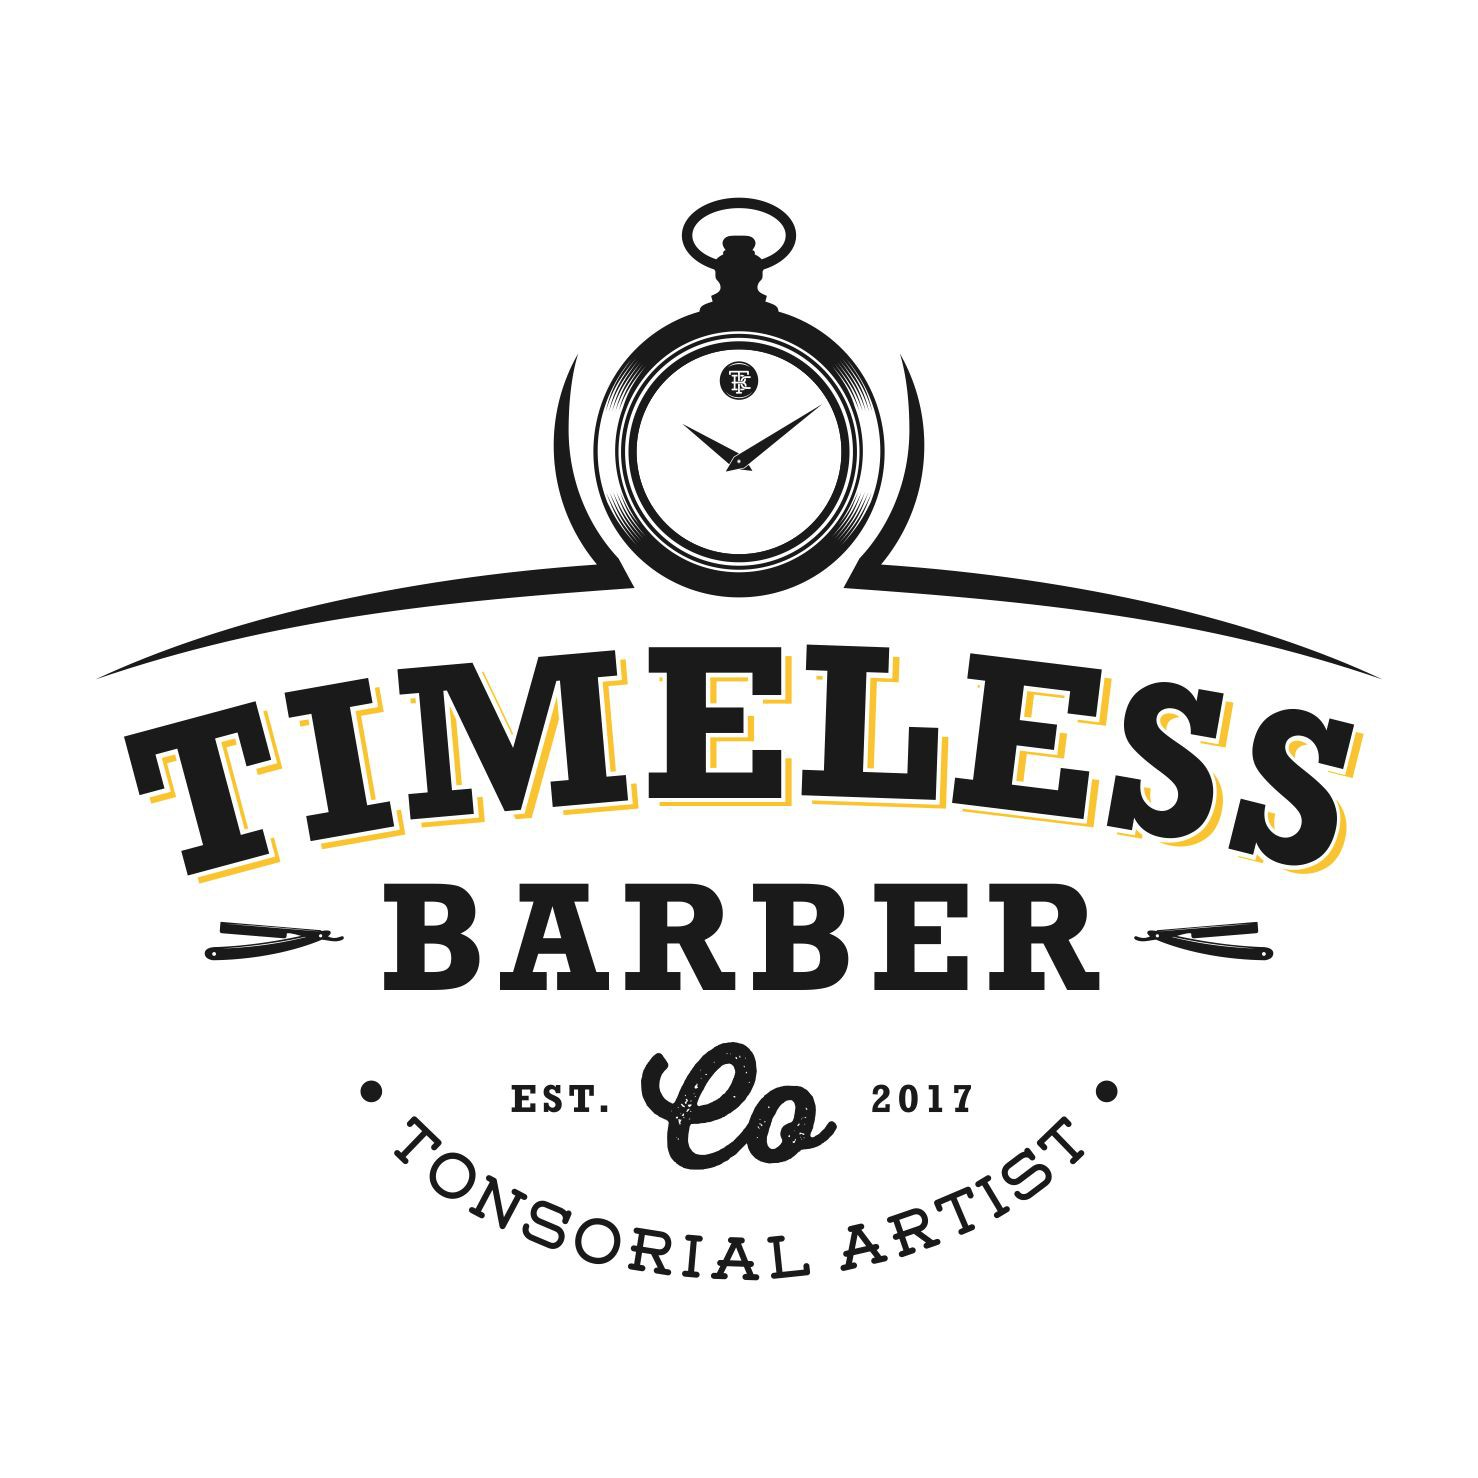 Tonsorial Artist/Barbershop logo.